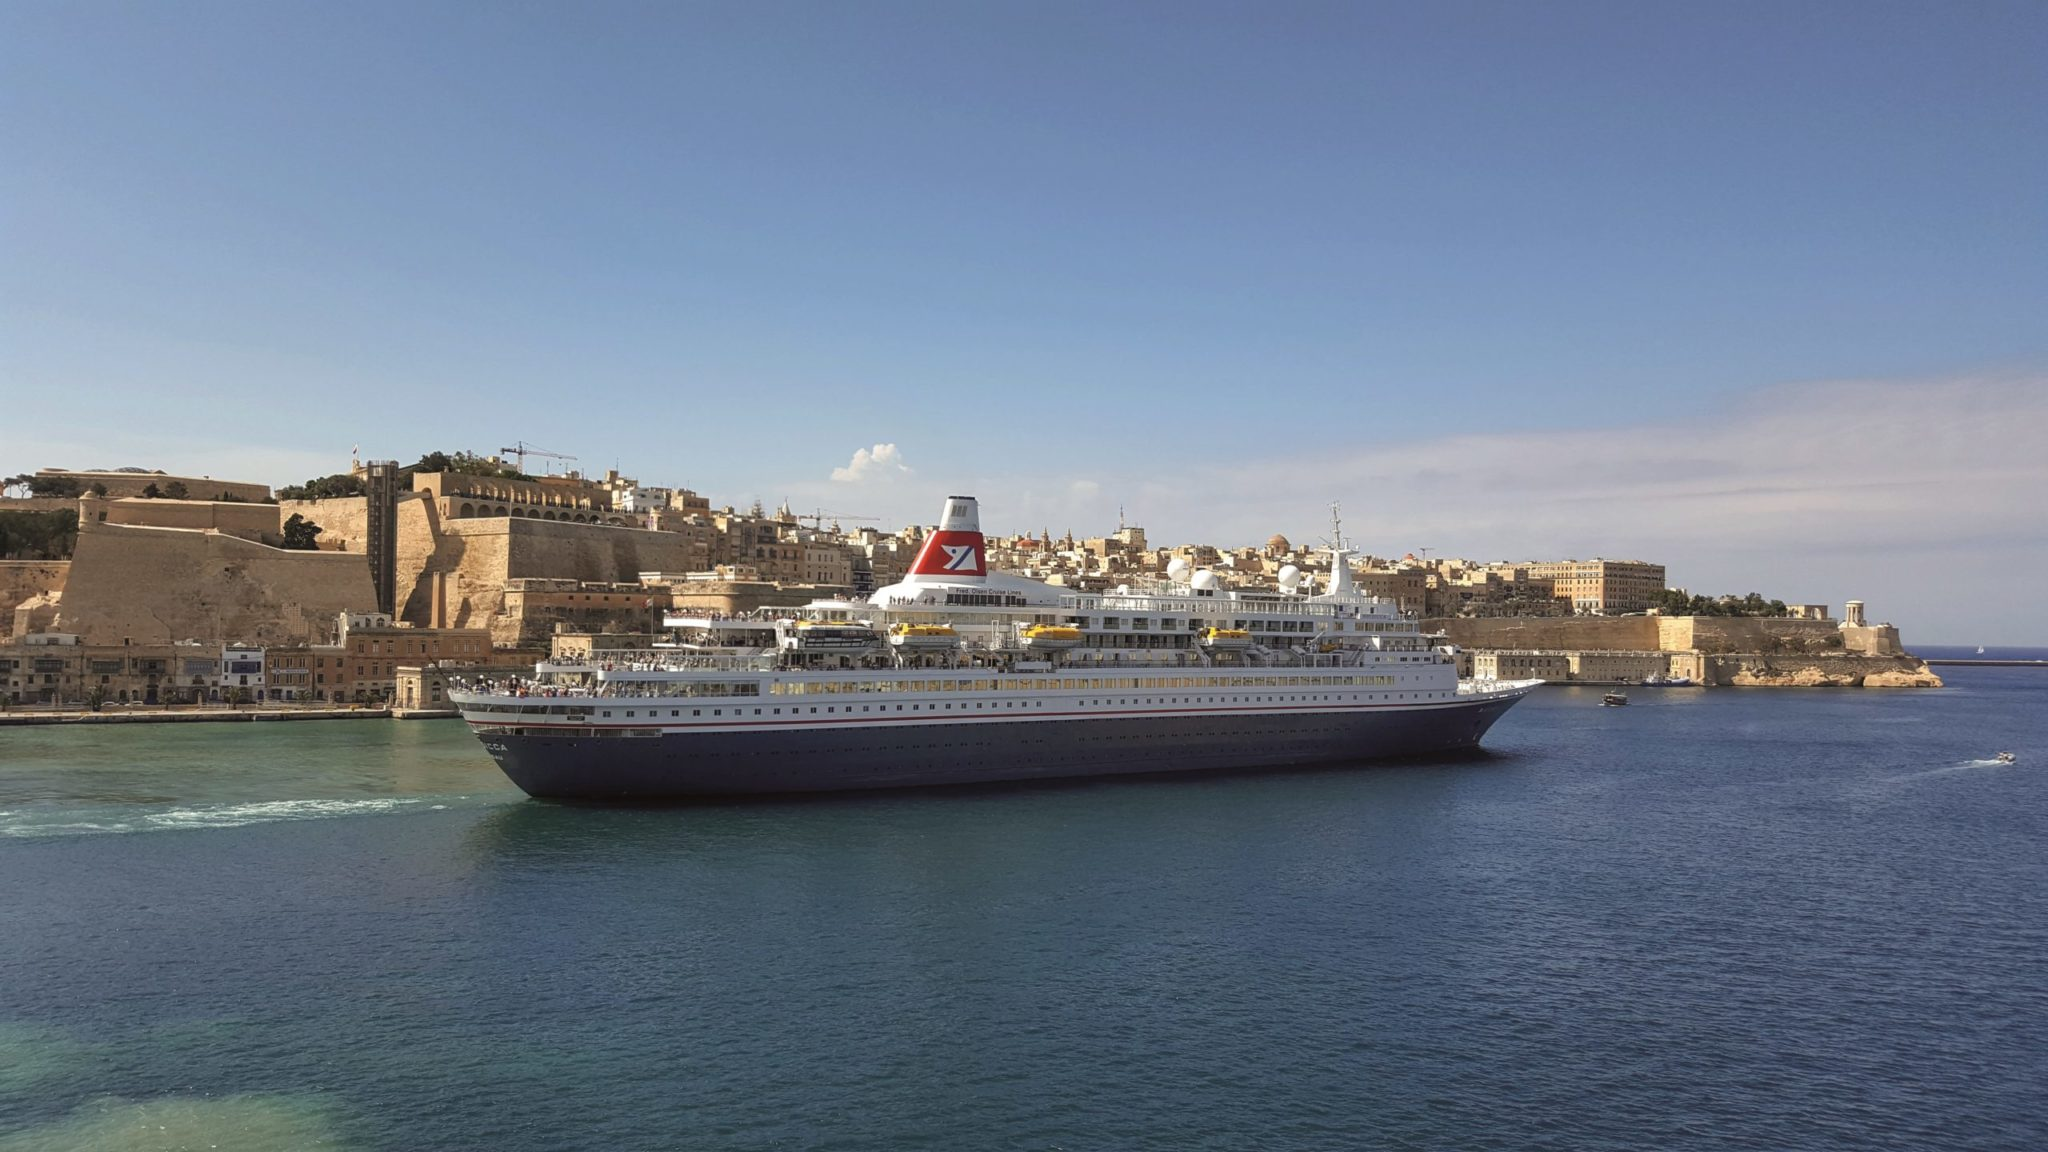 Boudicca in Malta